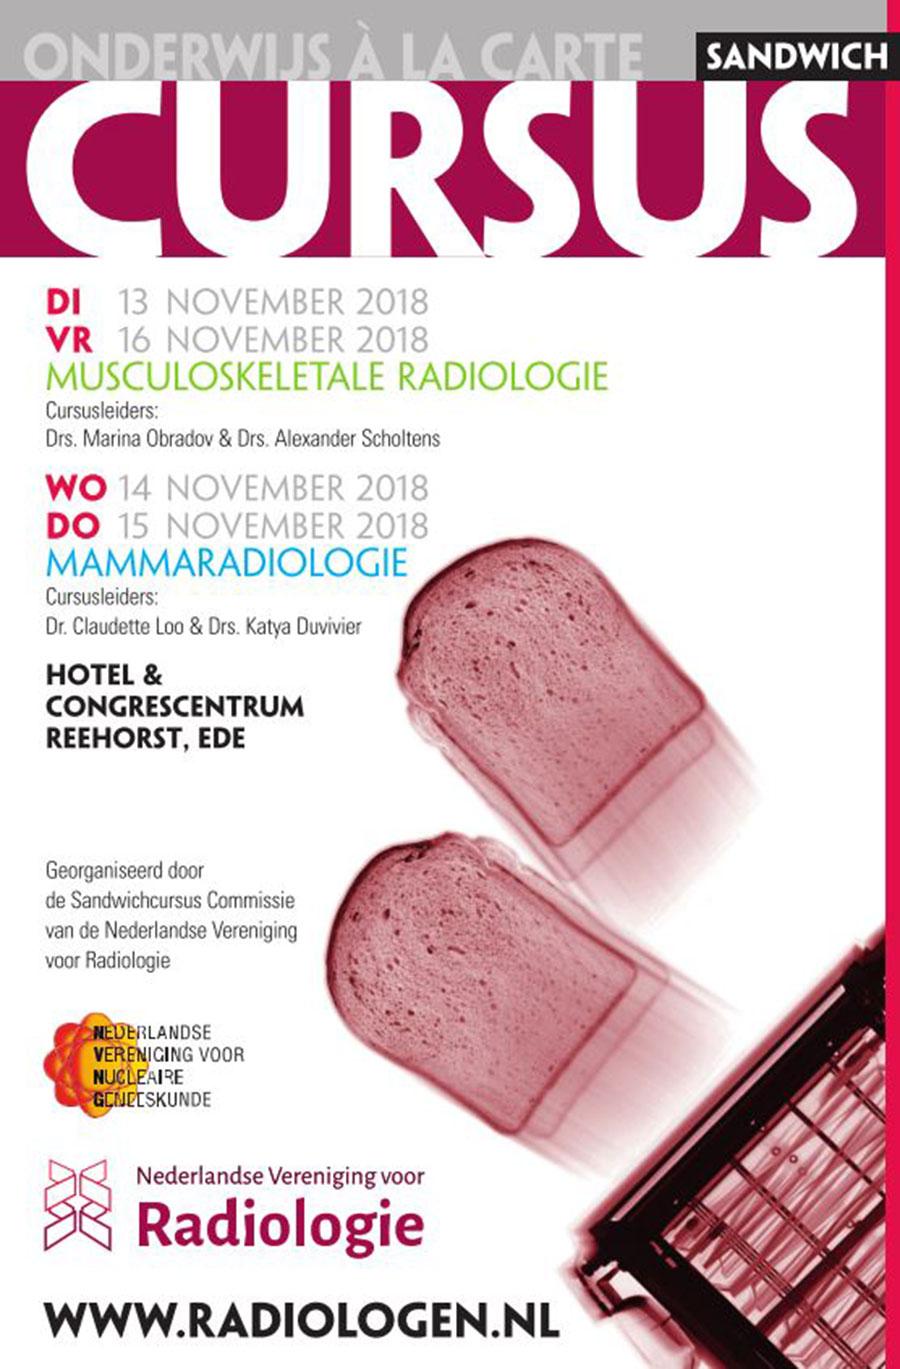 vanzoelenmedical-sandwichradiologie